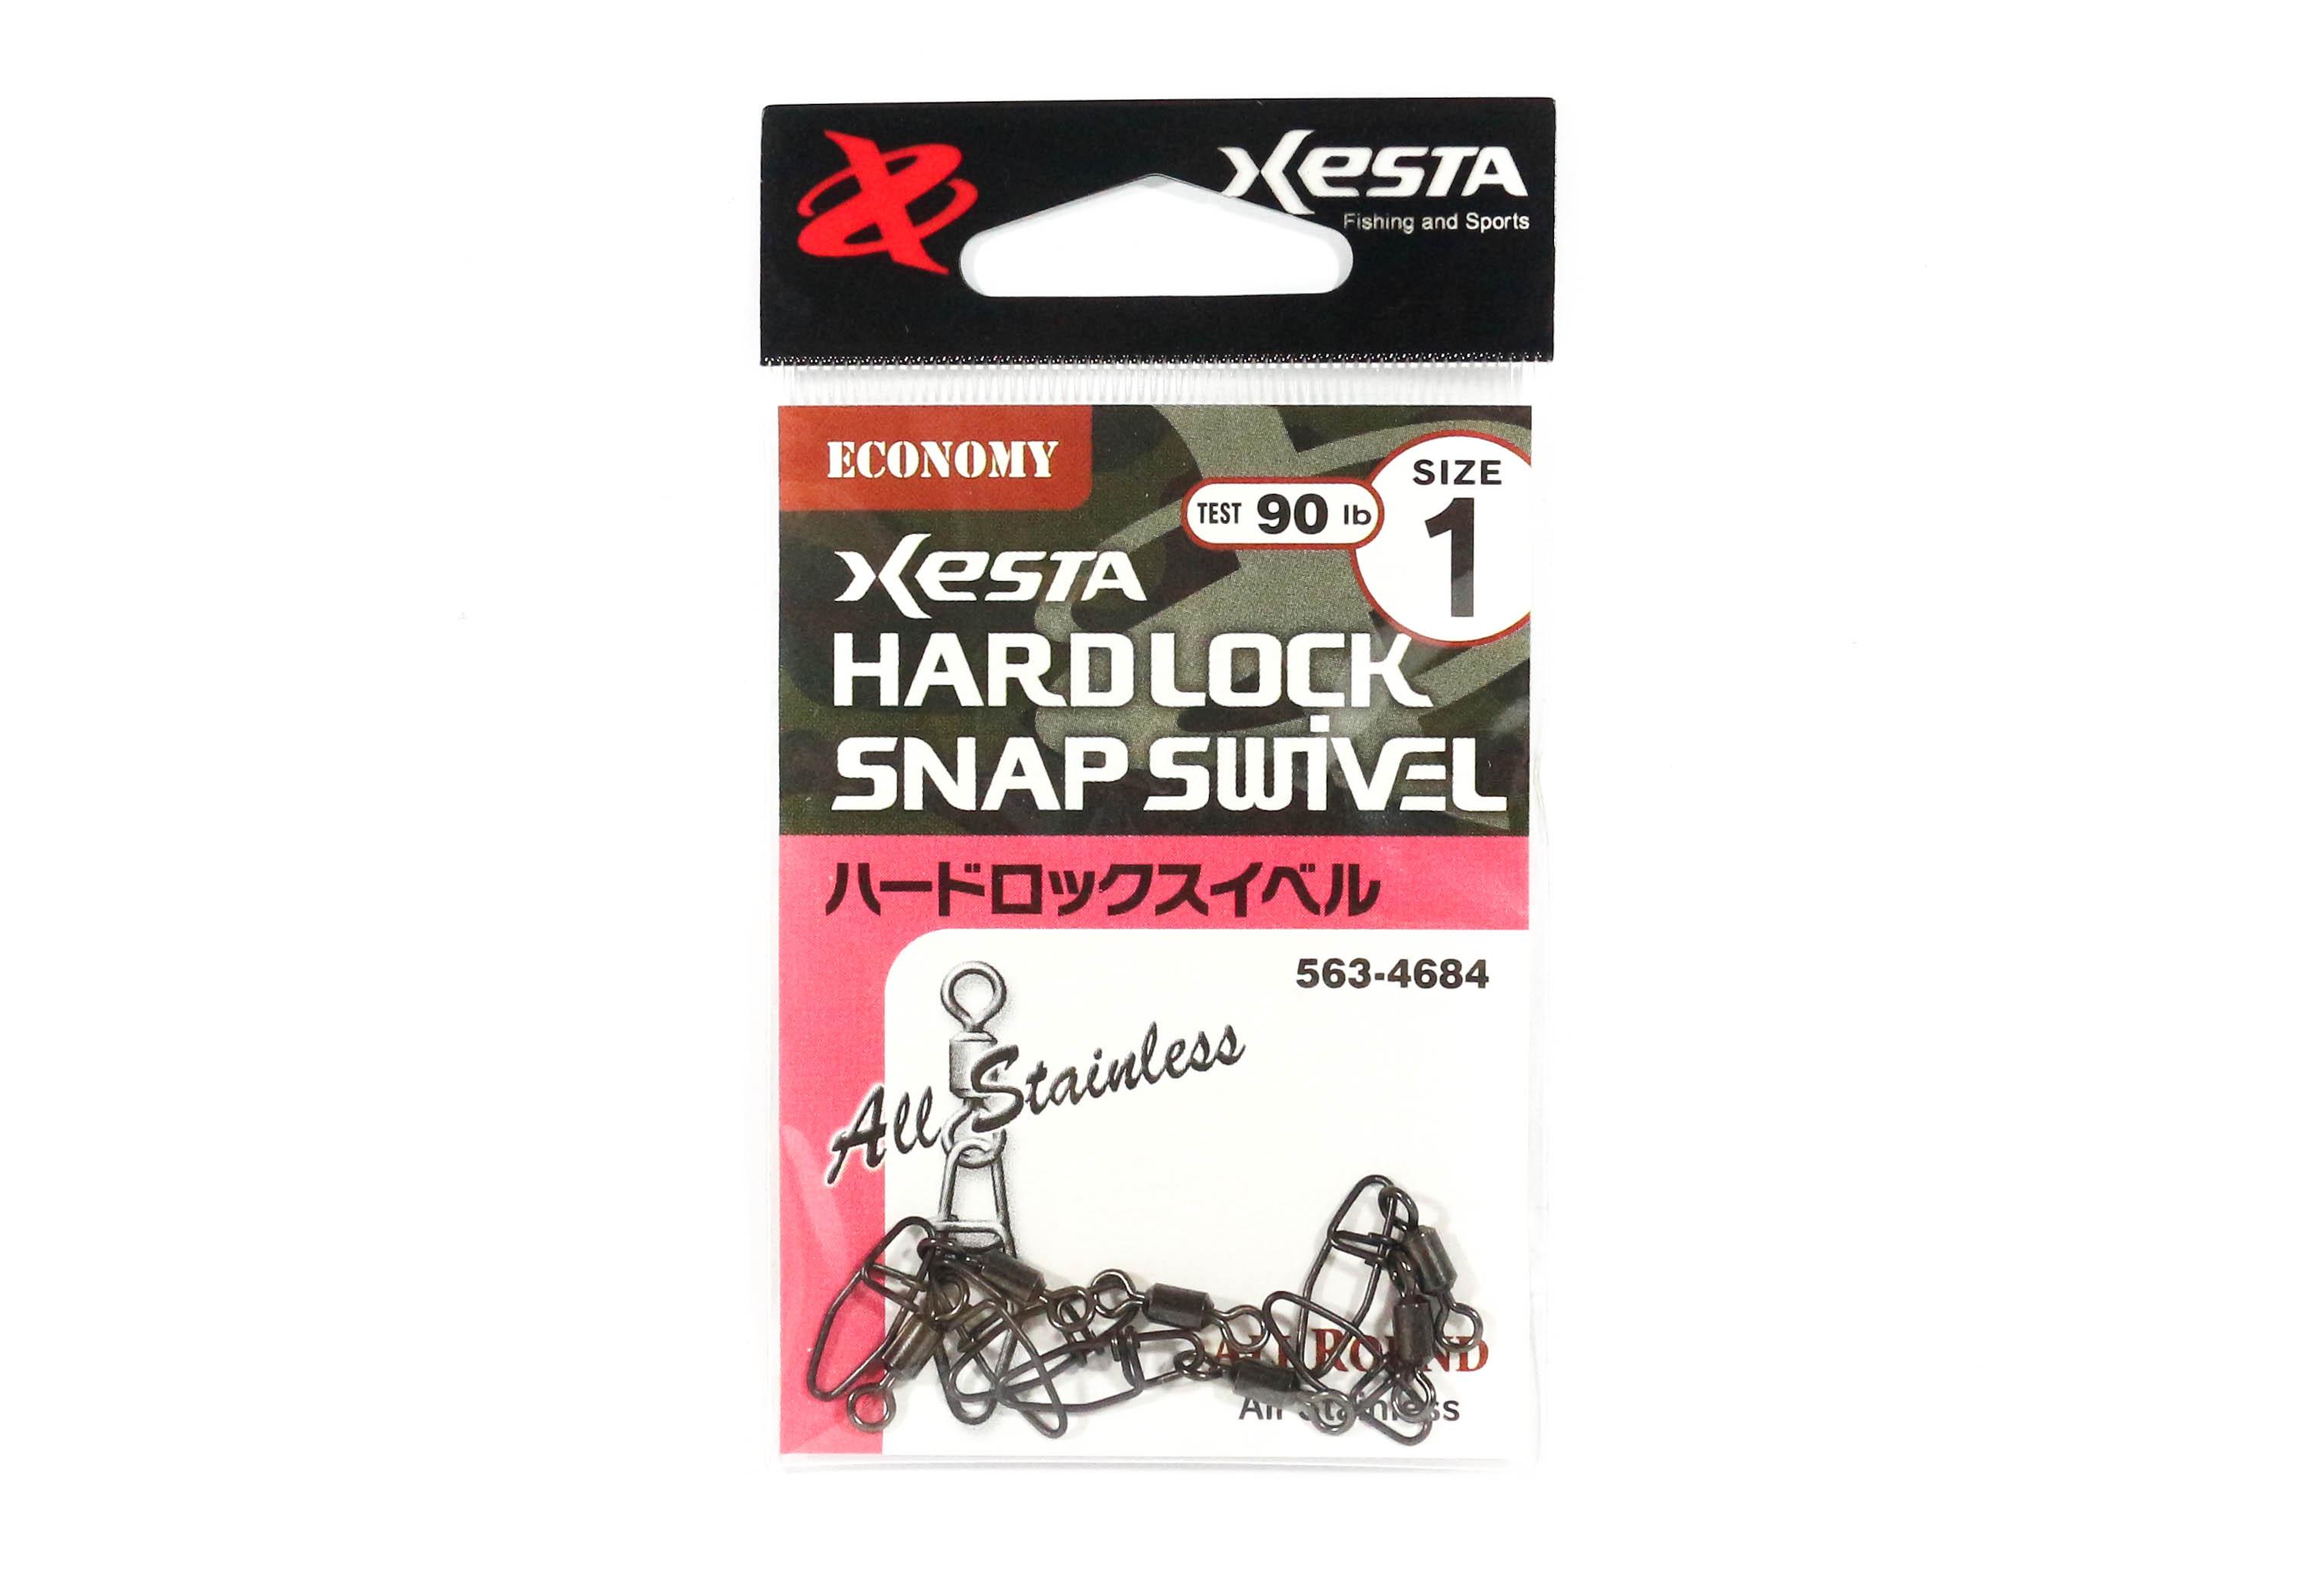 Xesta Hard Lock Snap Swivel Size 1 90 lb , 6 pieces (4684)